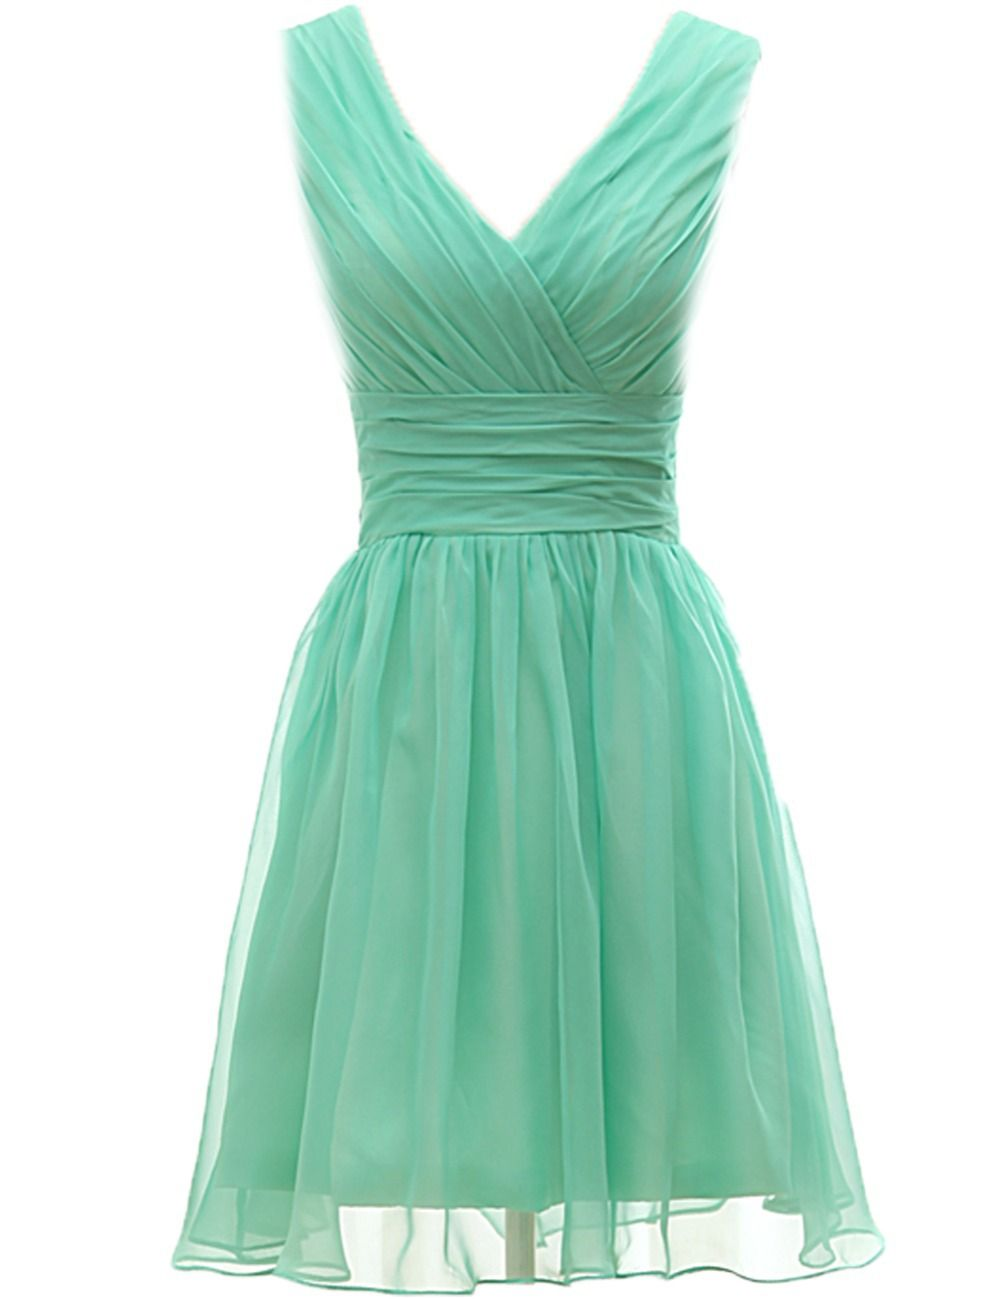 Green short dress for wedding  teal bridesmaids short dresses  Google Search  Kks wedding